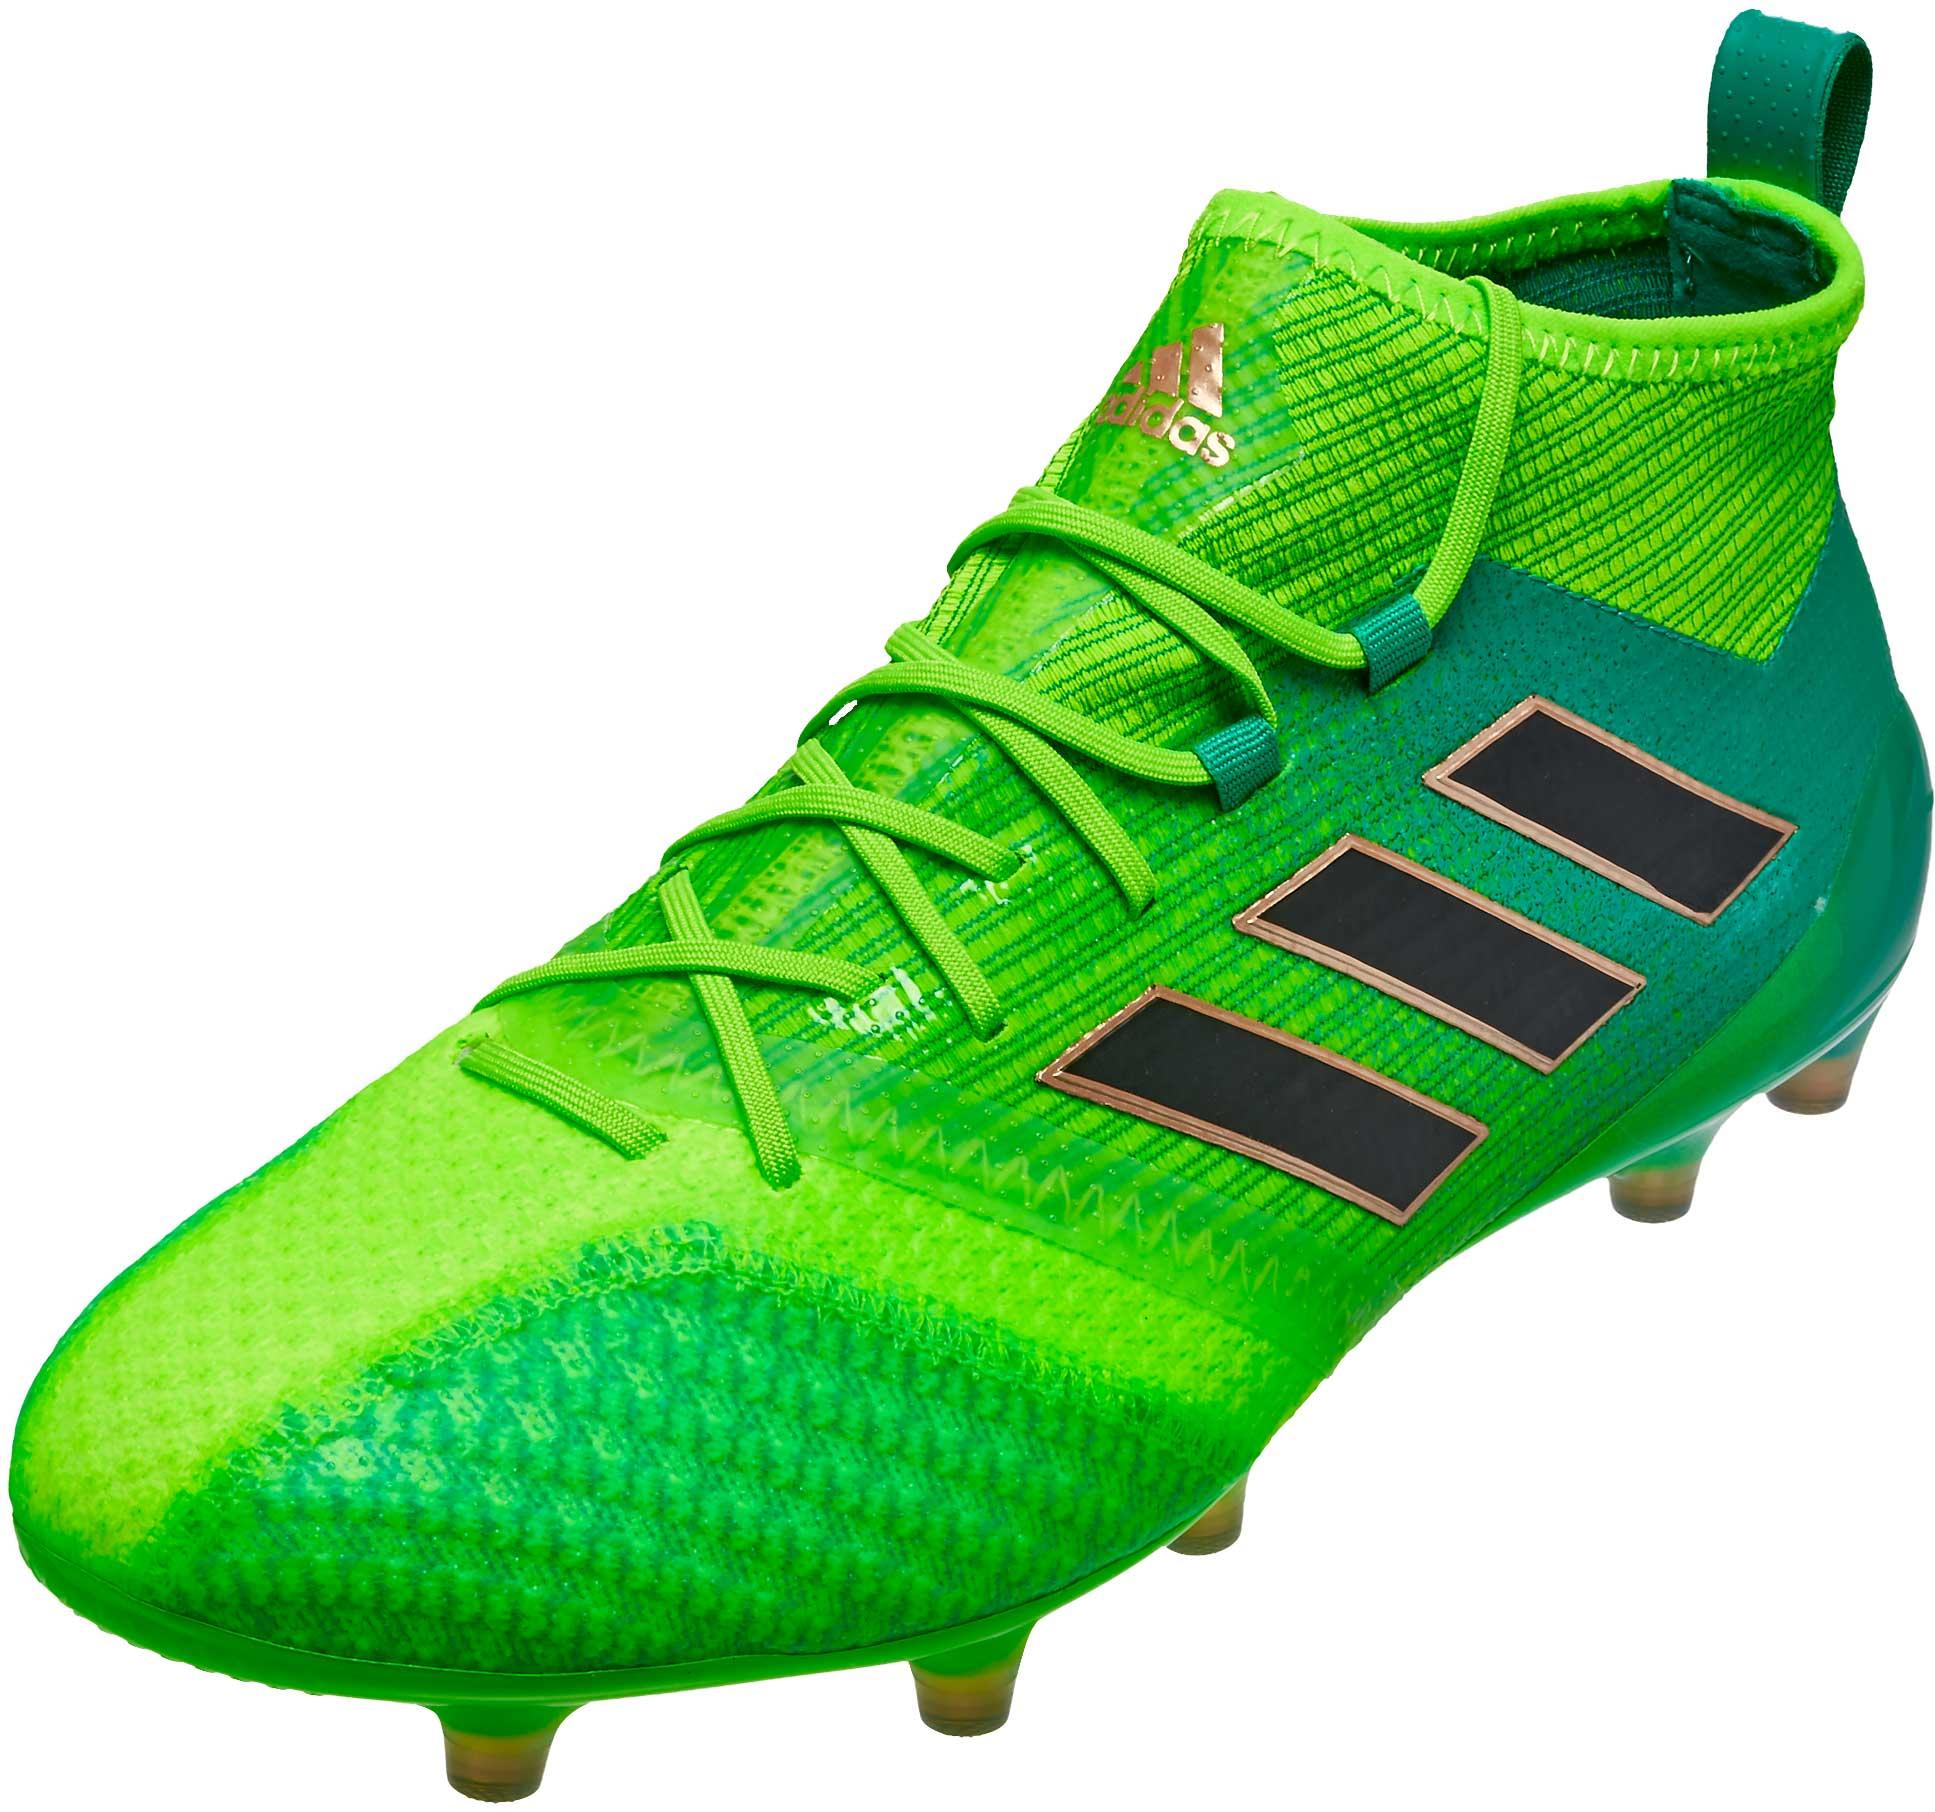 superior quality cb015 bca50 adidas ACE 17.1 Primeknit FG Soccer Cleats – Solar Green   Black